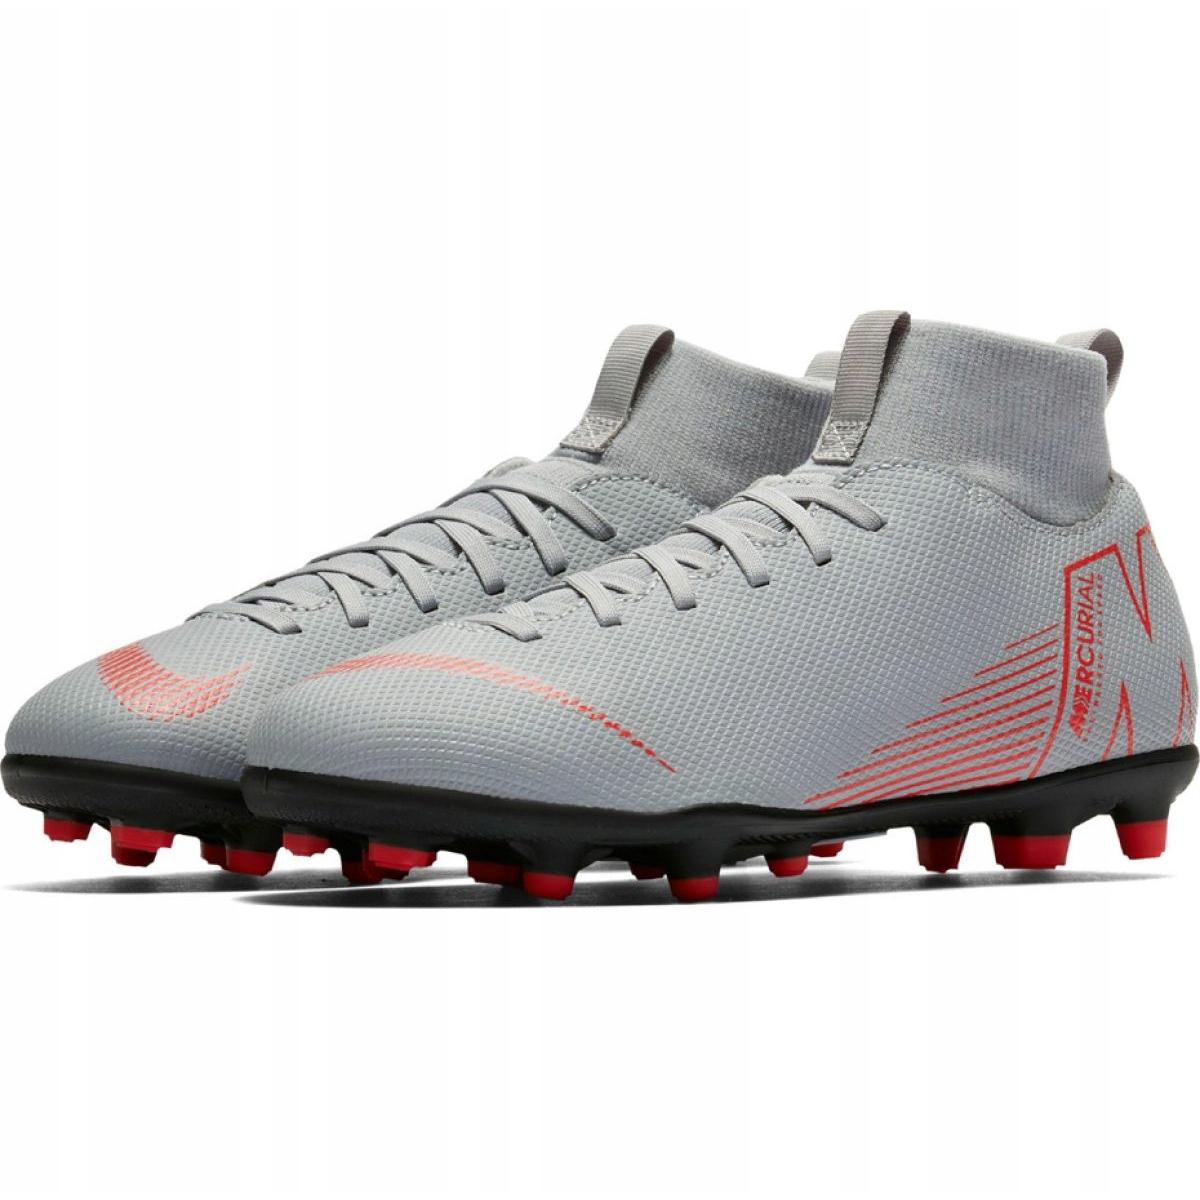 timeless design 26ad9 01b3a Football shoes Nike Mercurial Superfly 6 Club Mg Jr AH7339 060 white